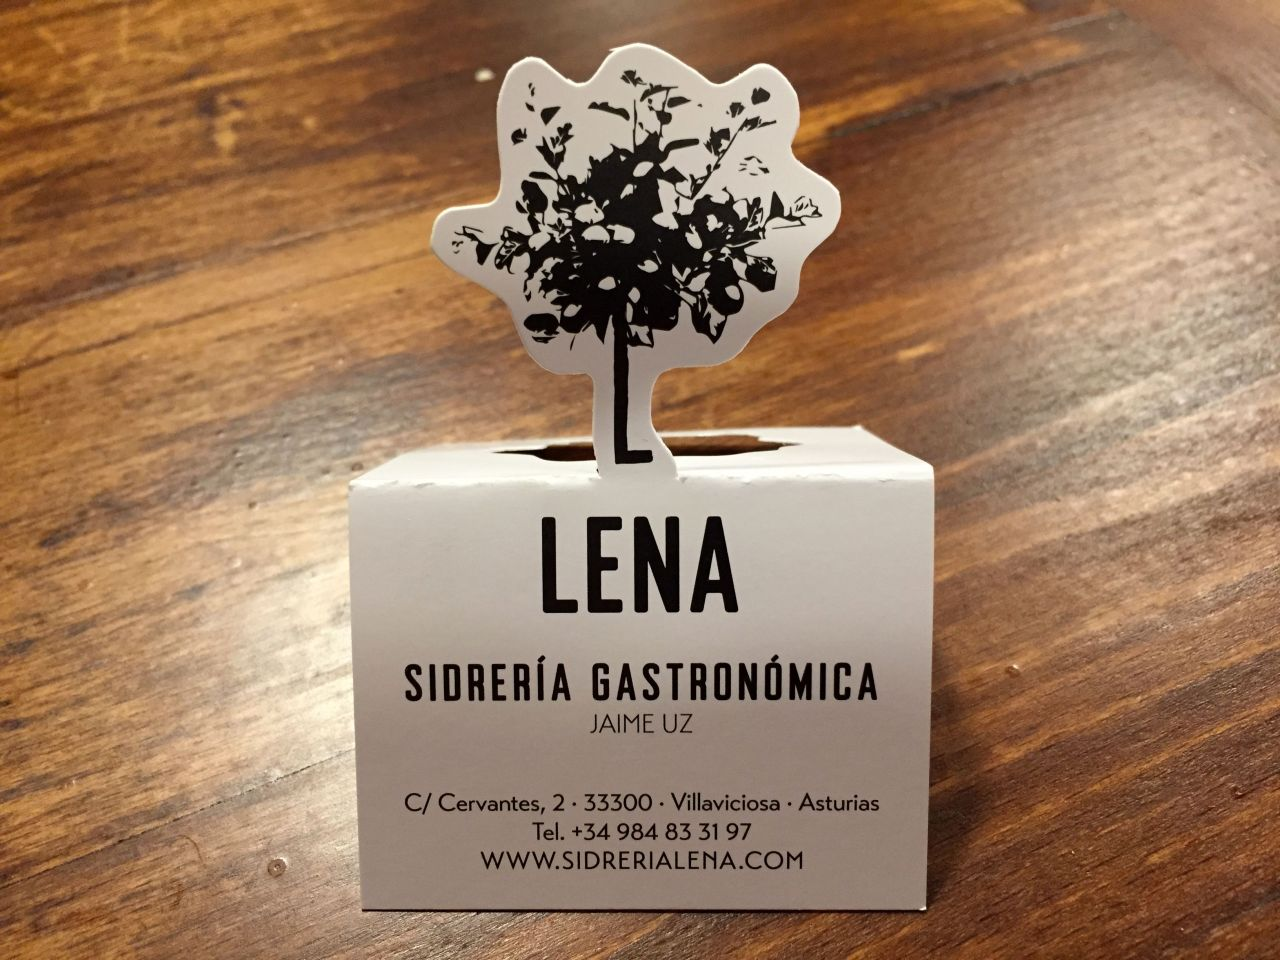 Lena by JaimeUz